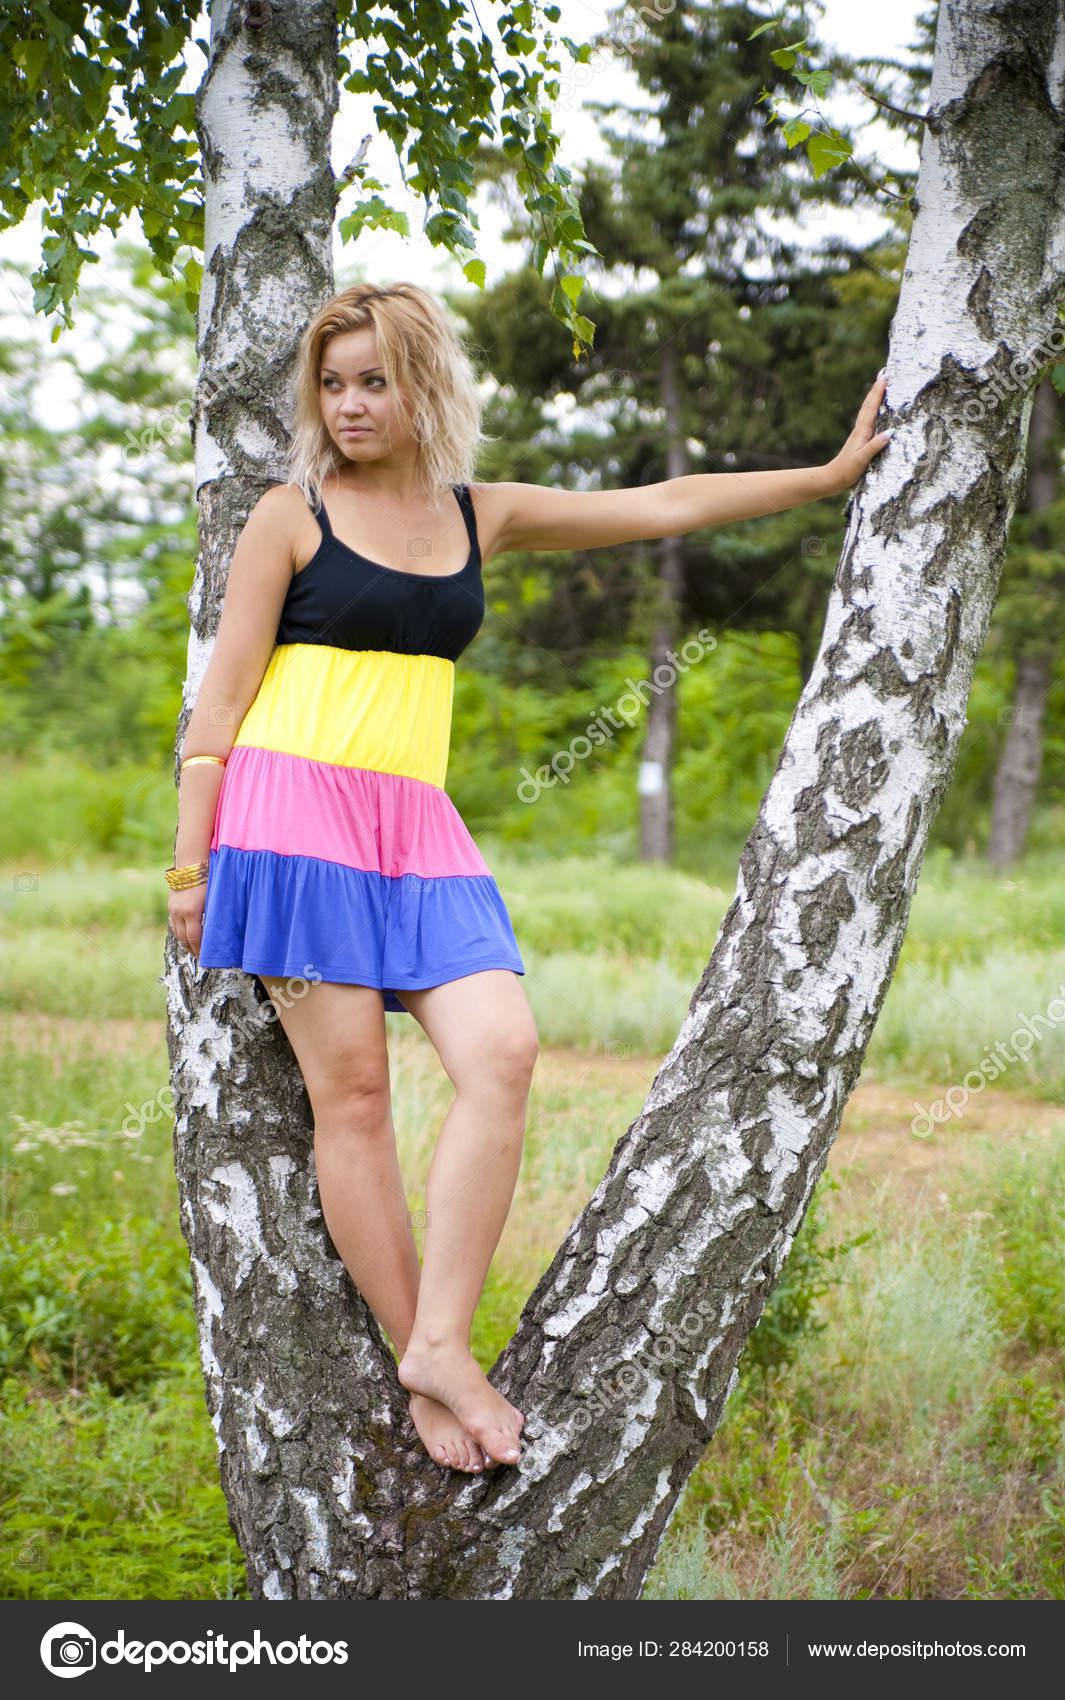 https://st4.depositphotos.com/26568676/28420/i/1600/depositphotos_284200158-stock-photo-beautiful-girl-summer-forest-nature.jpg